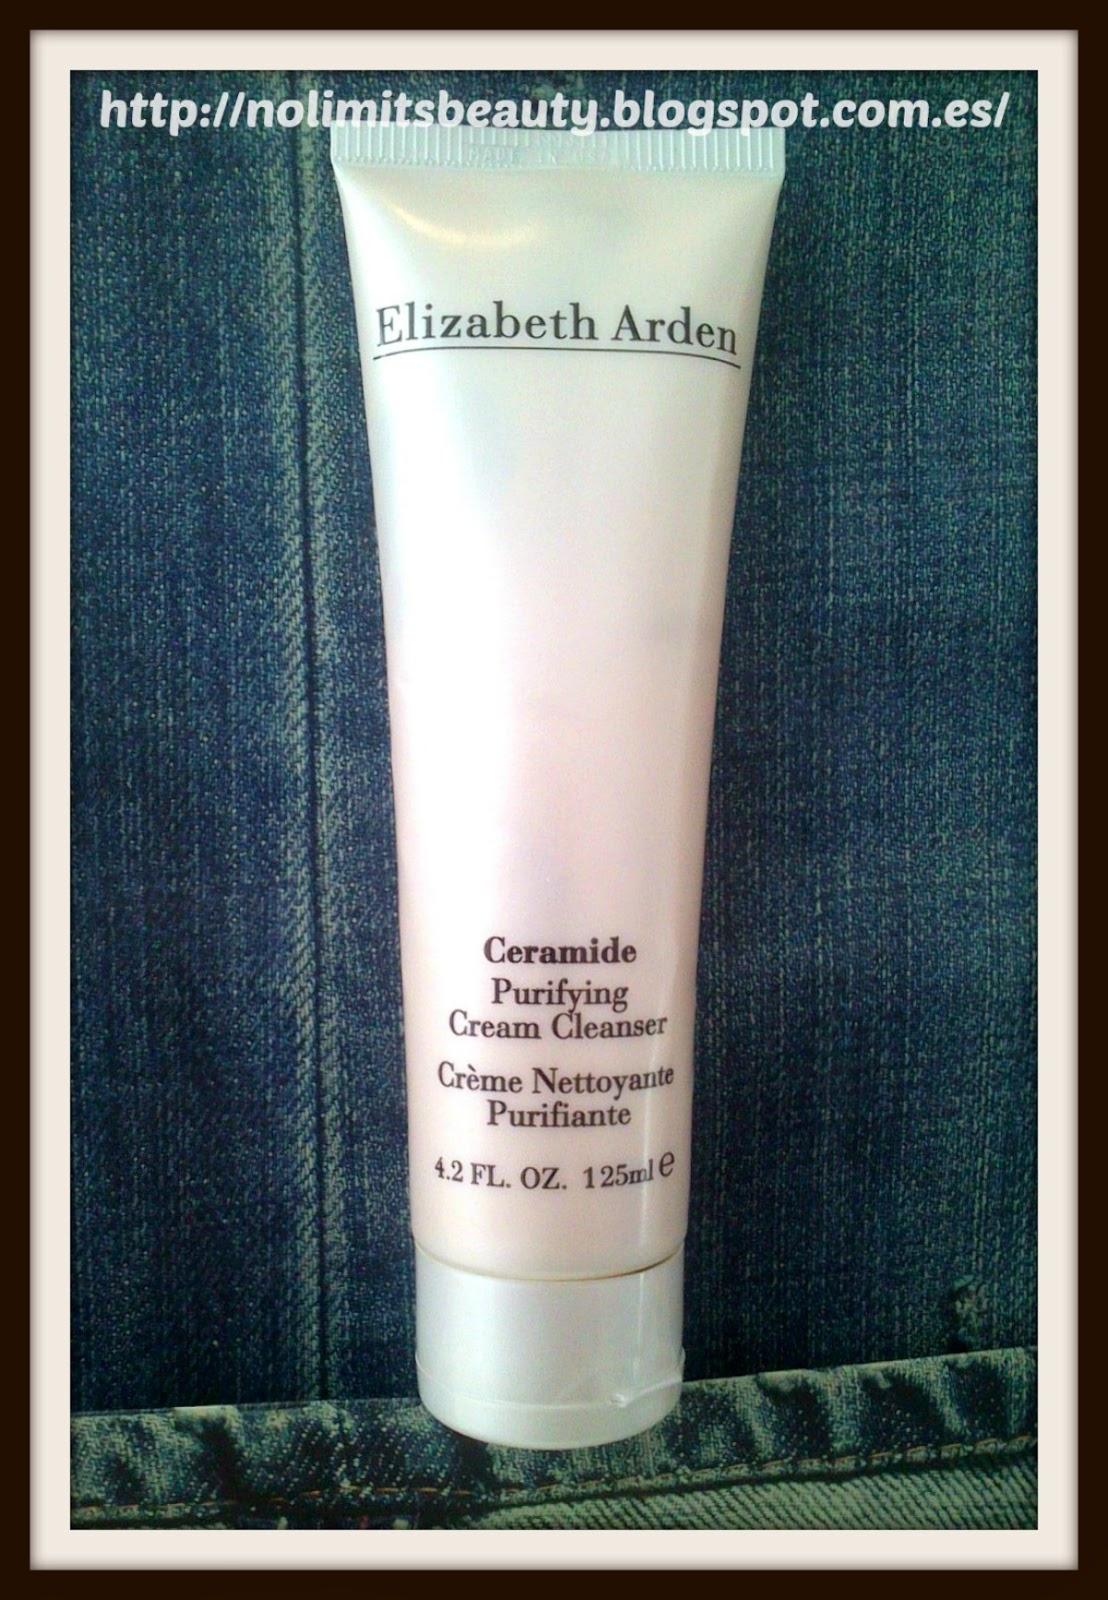 Ceramide Purifying Cream Cleanser de Elisabeth Arden